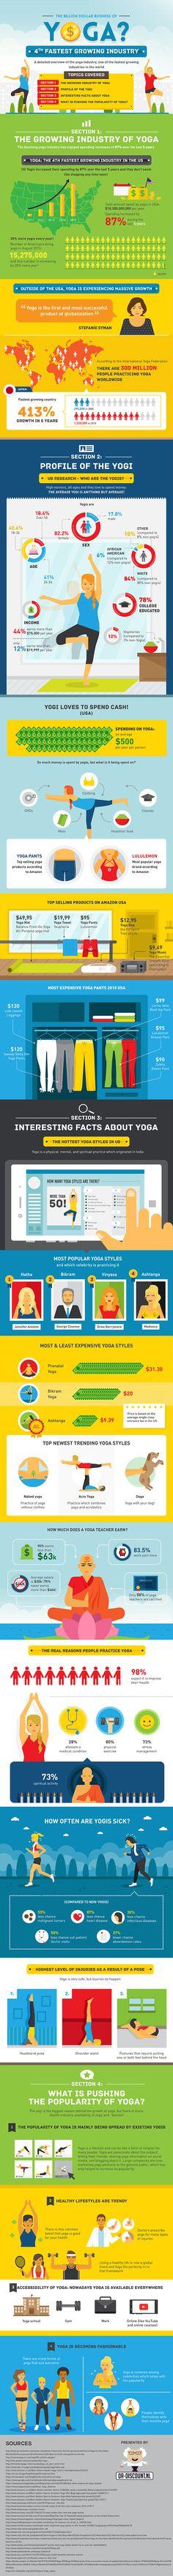 The billiogaon dollar business of yoga #infographic #Health #Yoga